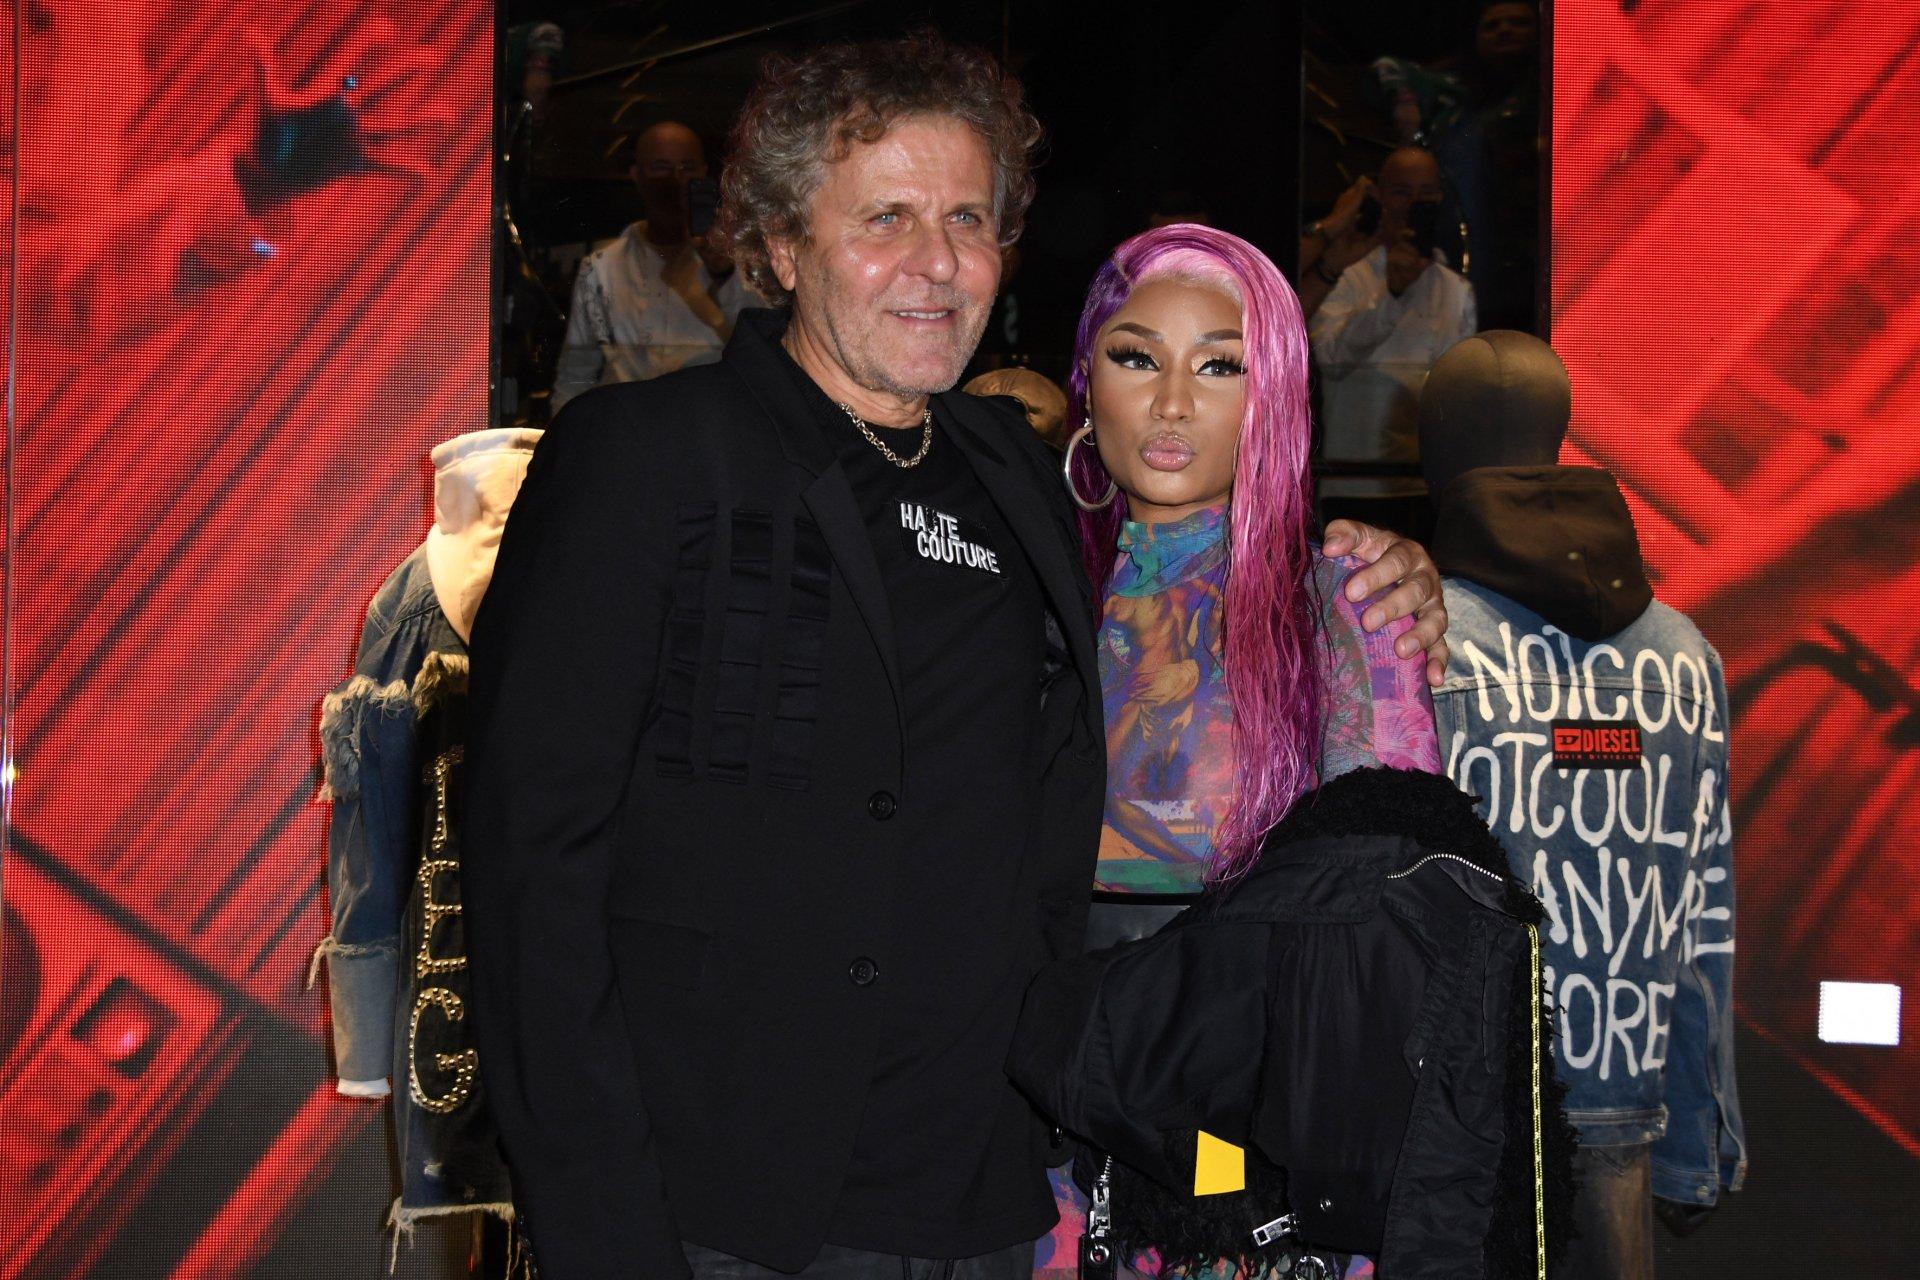 Nicki-Minaj-See-Through-TheFappeningBlog.com-44.jpg